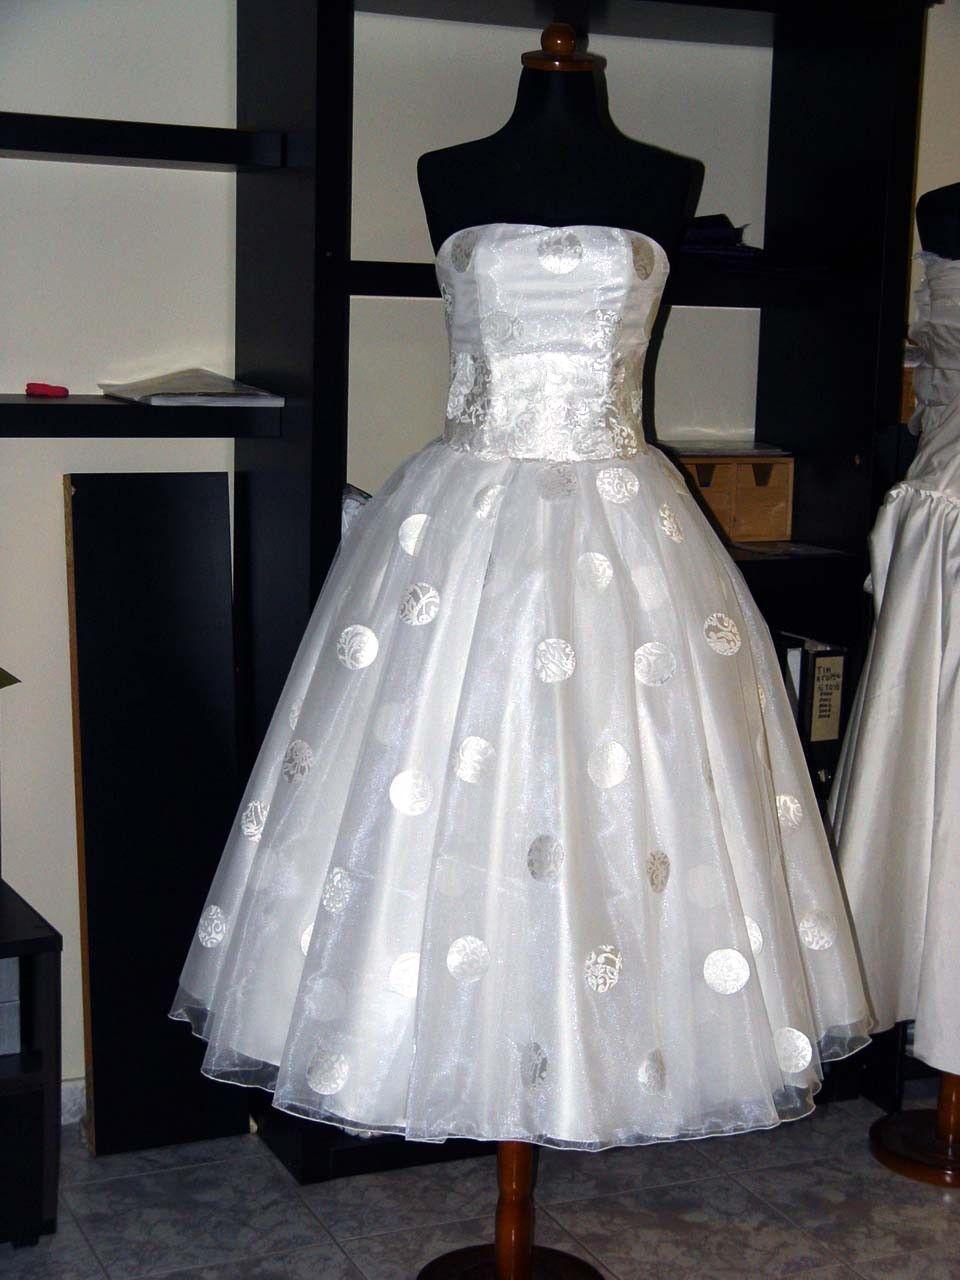 White polka dot wedding dress.